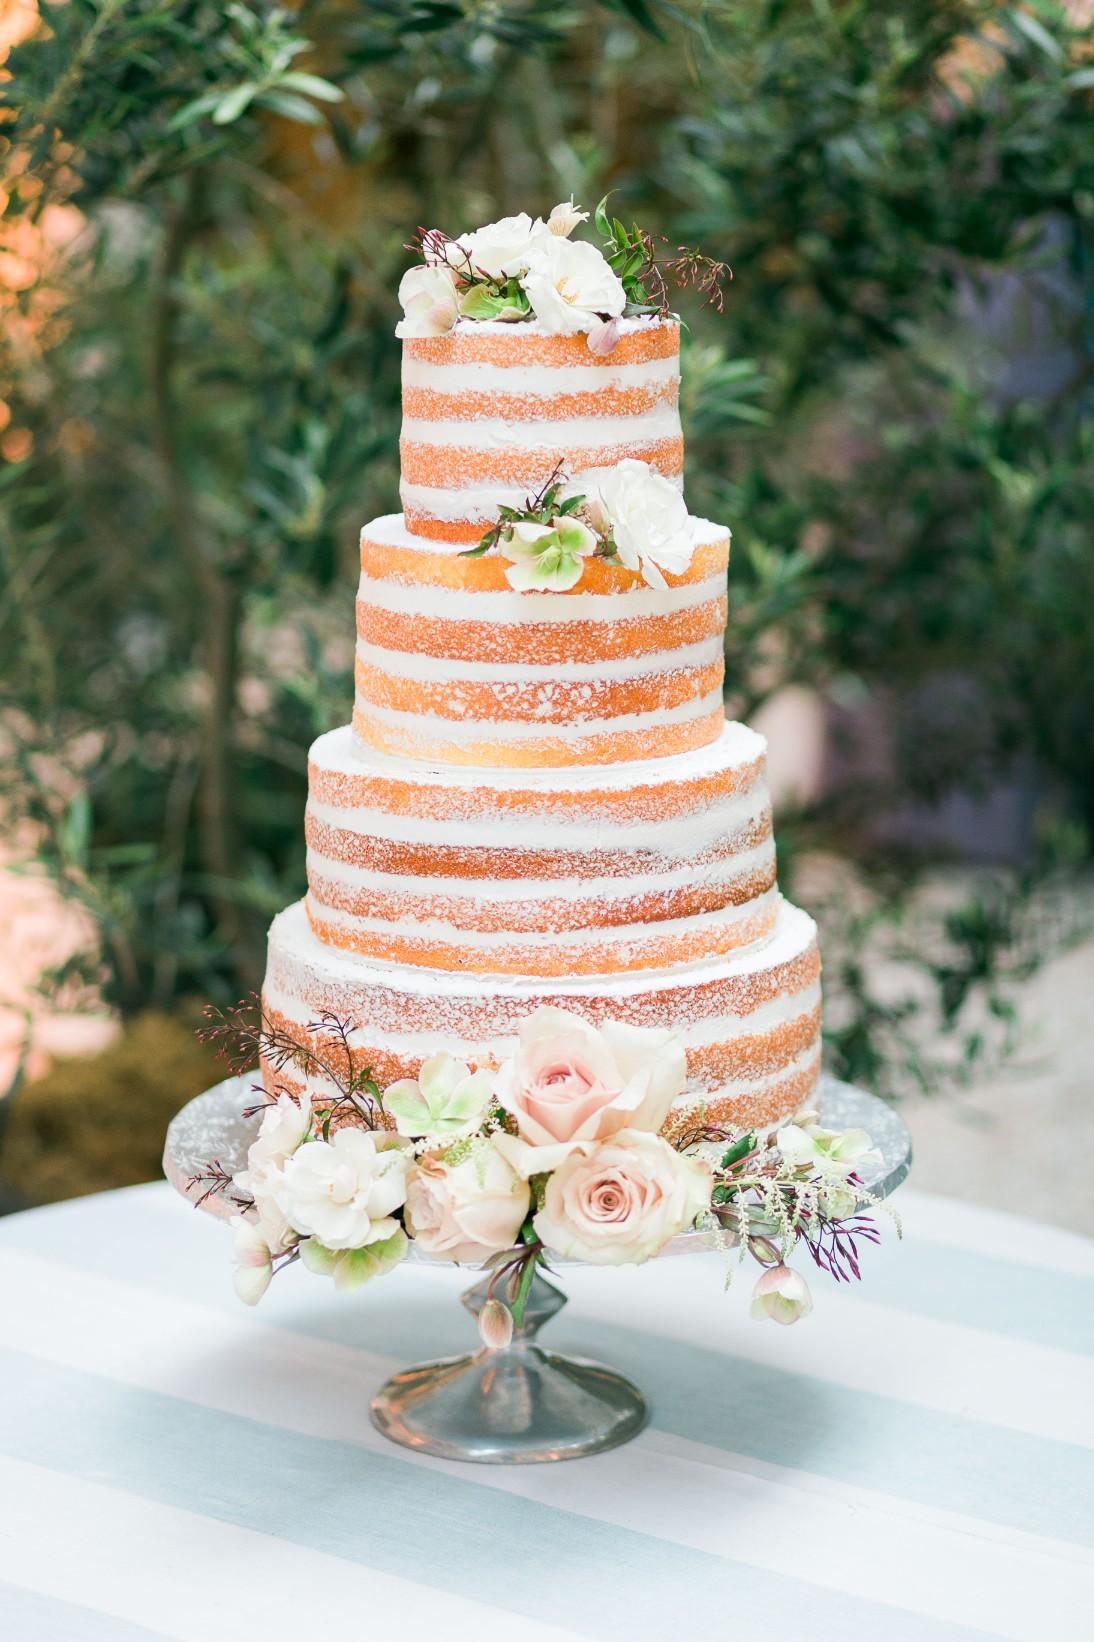 JBJ Pictures - Wedding Photographer San Francisco - Napa - Sonoma - SF Engagement Photos (61).jpg